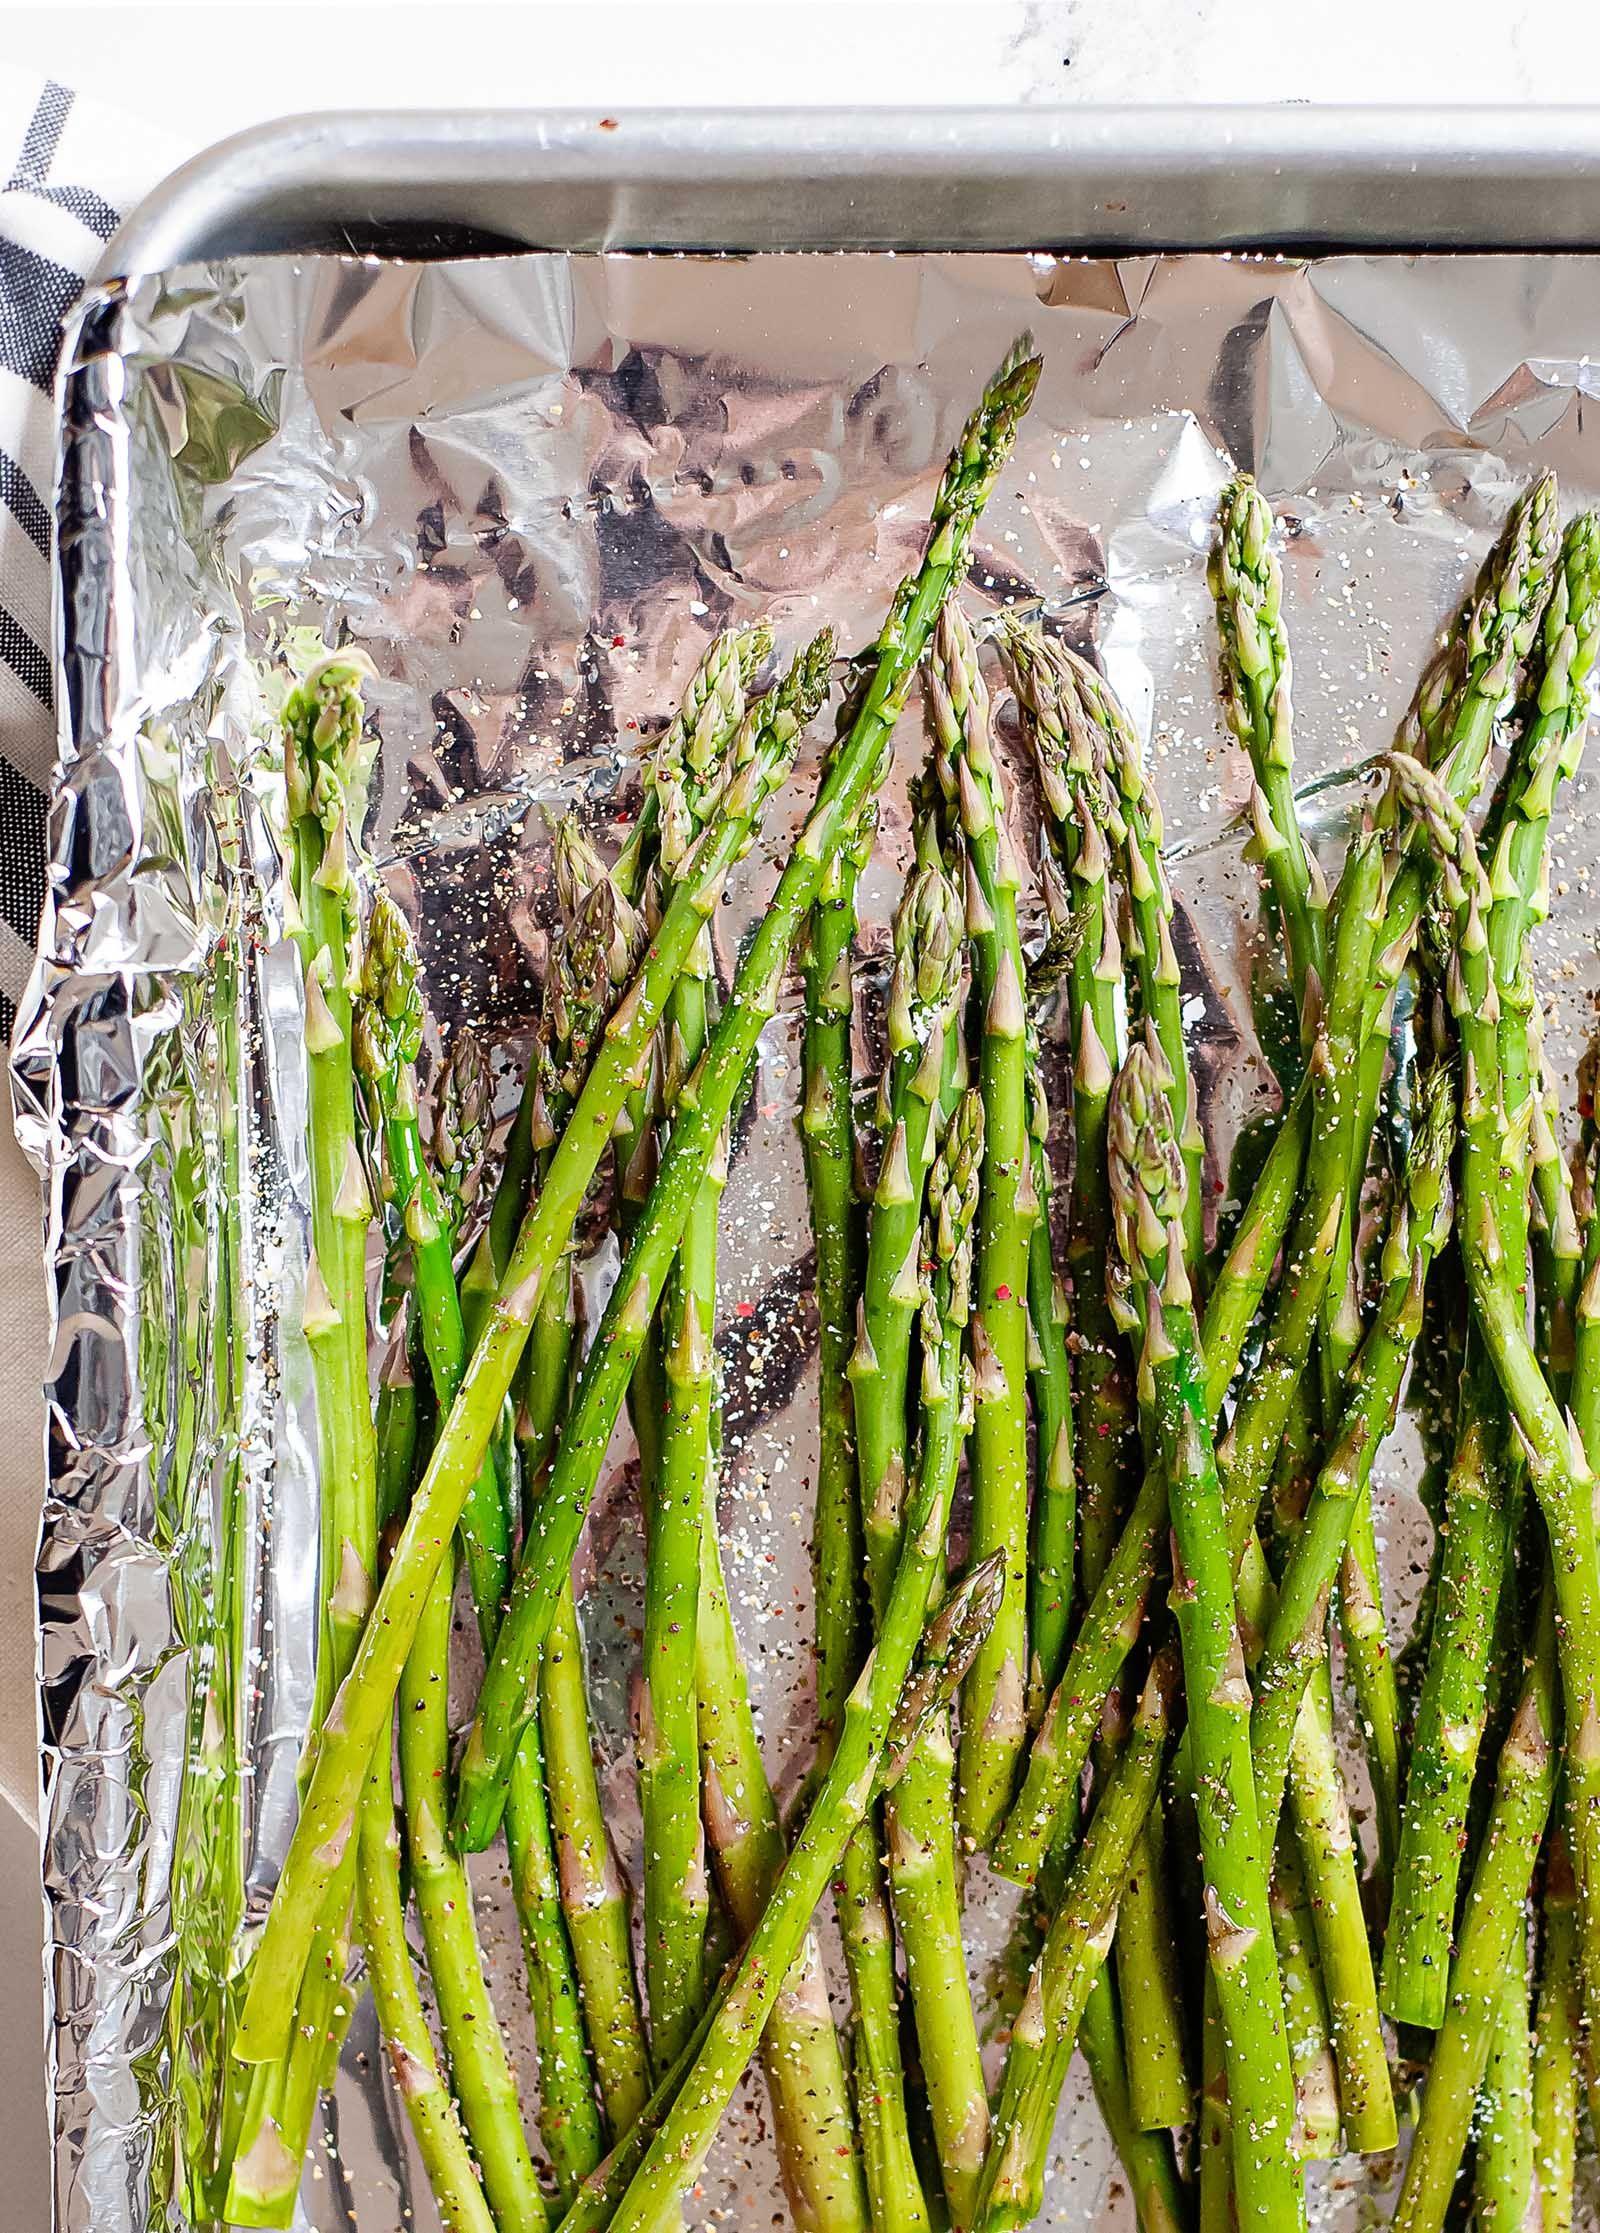 How To Prep Asparagus For Cooking Simplyrecipes Com In 2020 How To Cook Asparagus Asparagus Ways To Cook Asparagus